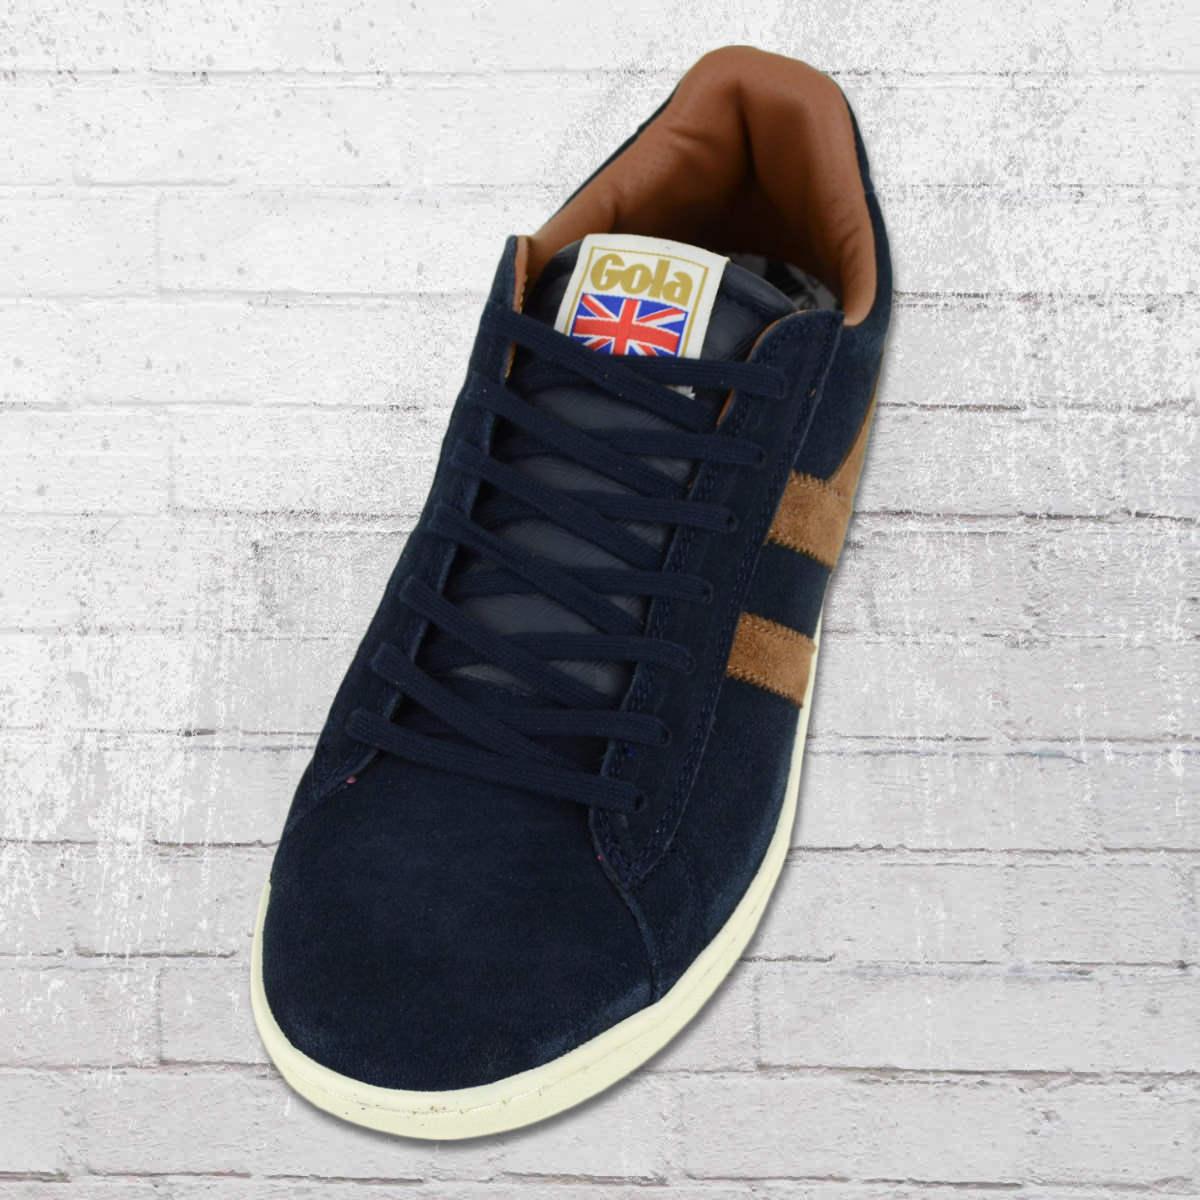 VANS Women Shoes Classic Slip On Kenya black true white 20,00 €. Close. Gola  Male Shoes Equipe Suede Trainer navy blue tobacco